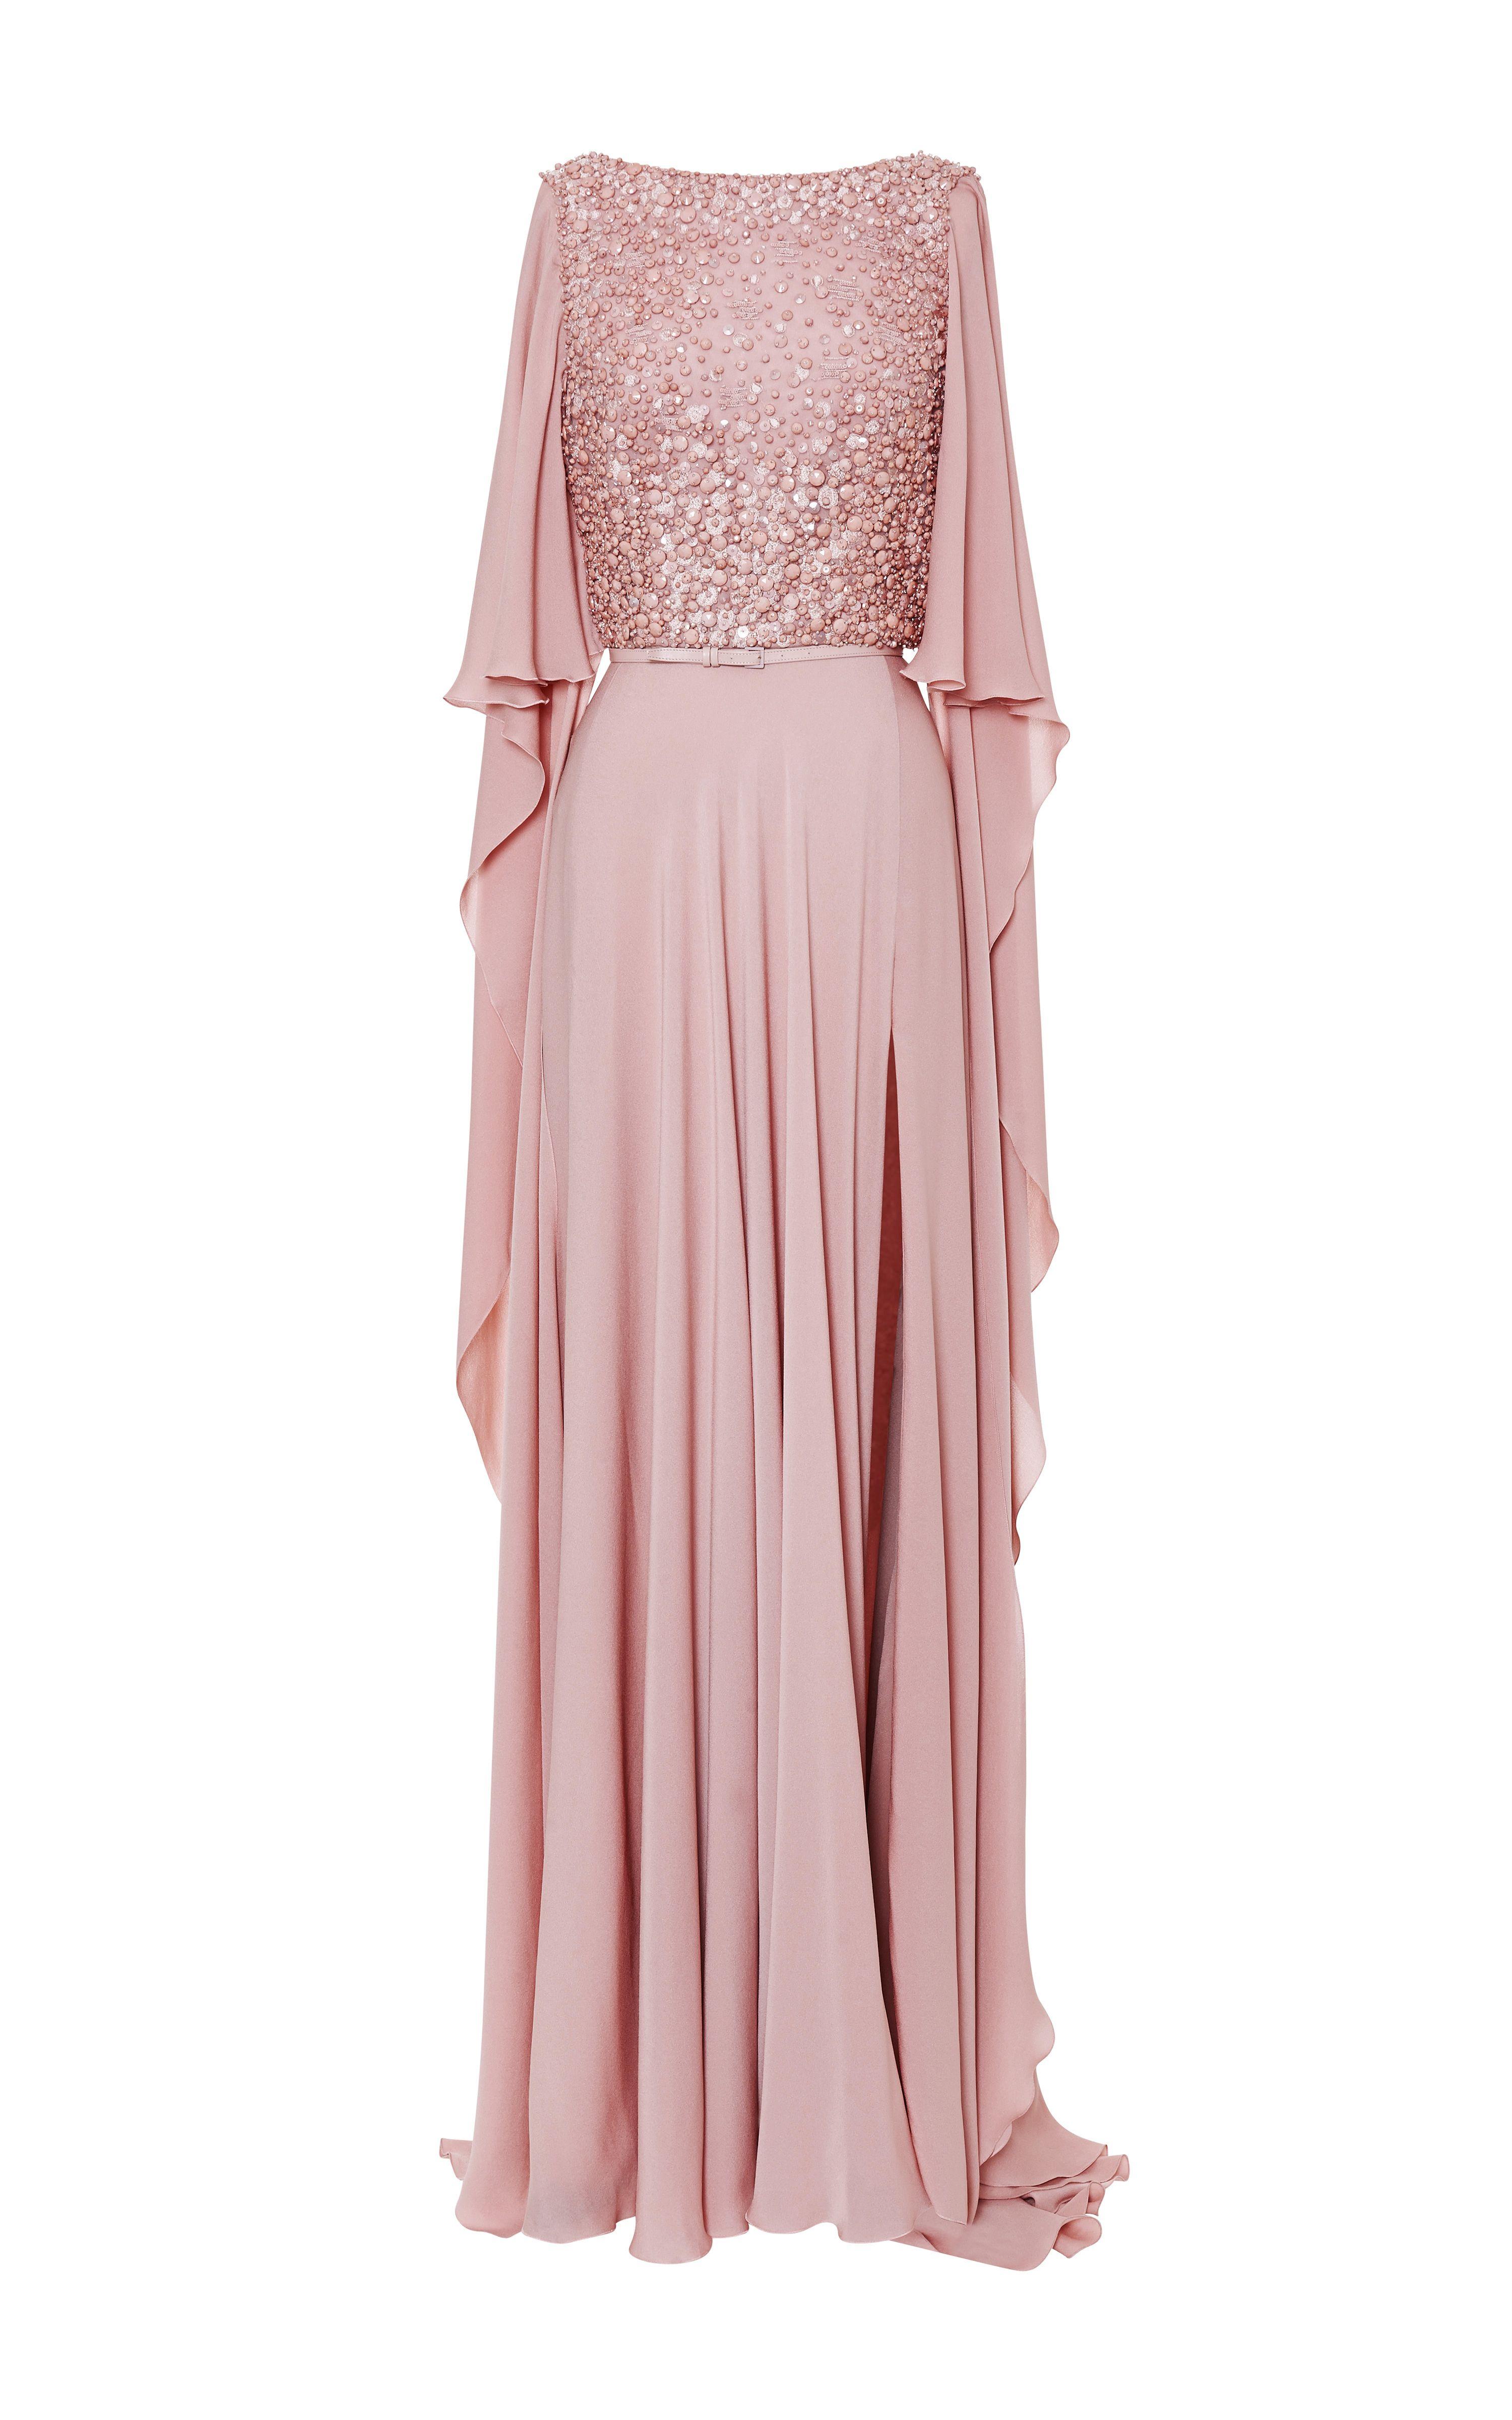 blush rosa embroidered kleid